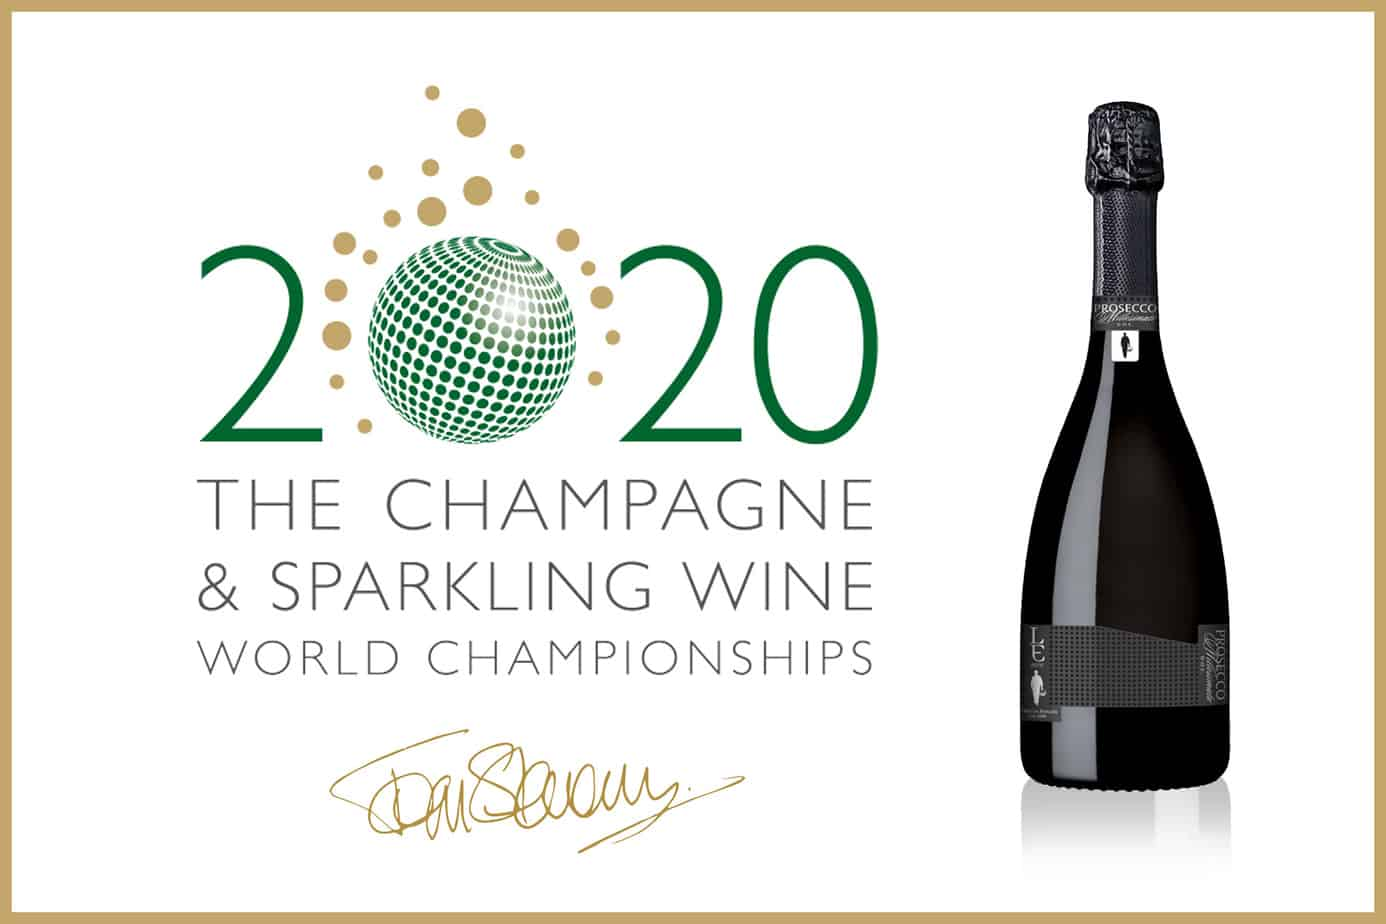 Champagne & Sparkling Wine World Championship 2020 - Italia